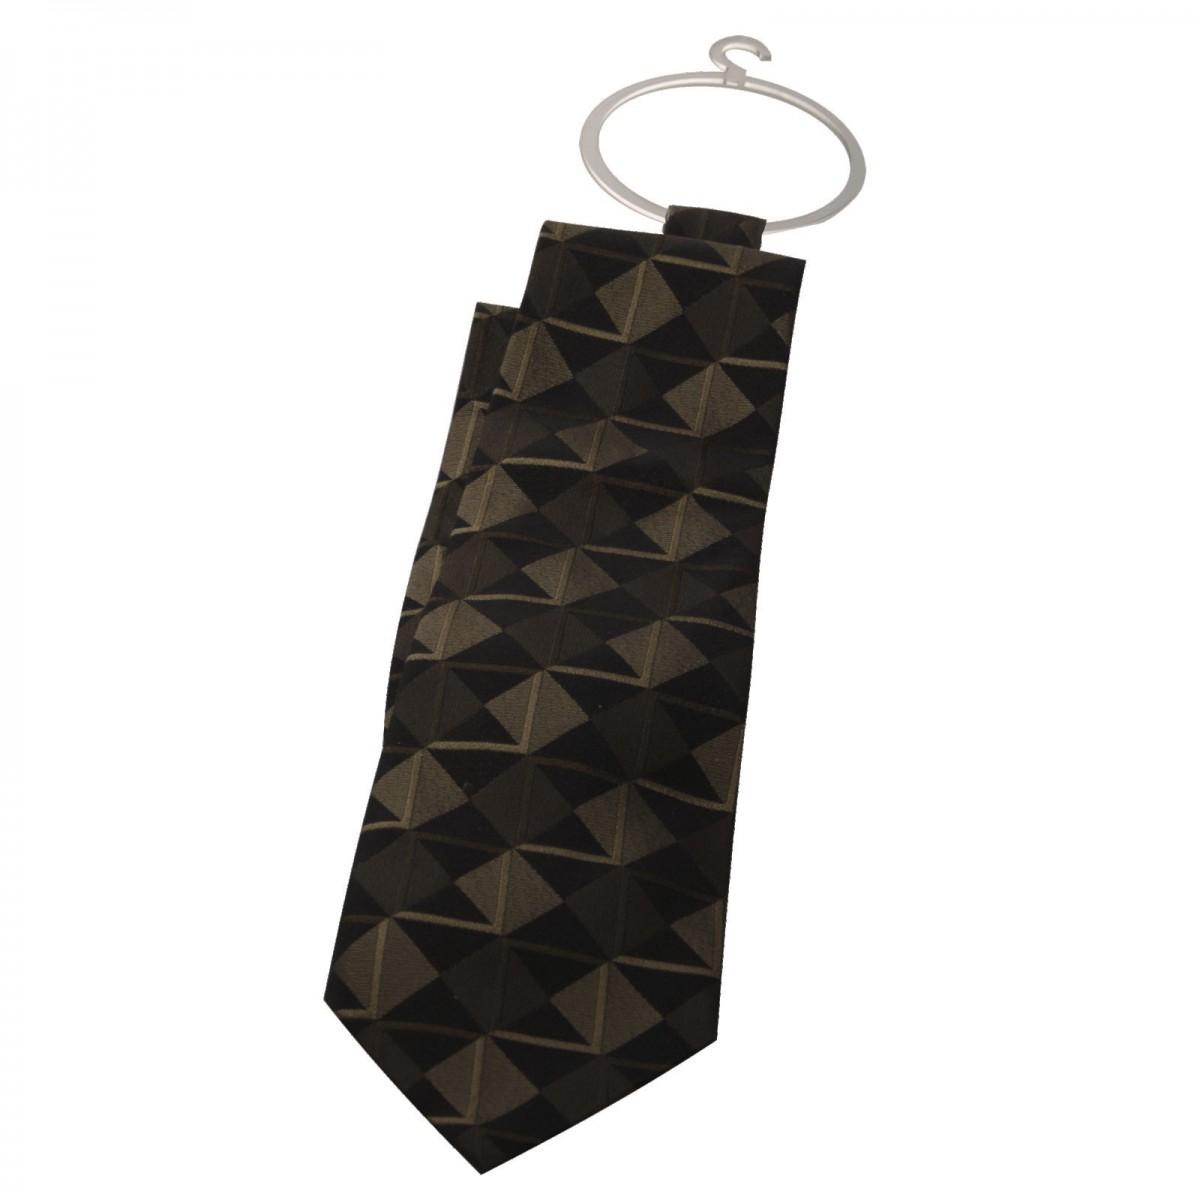 E-303 EPC-B - Porta cravatte e foulard in plexiglass trasparente - Misure 8 x H10 cm